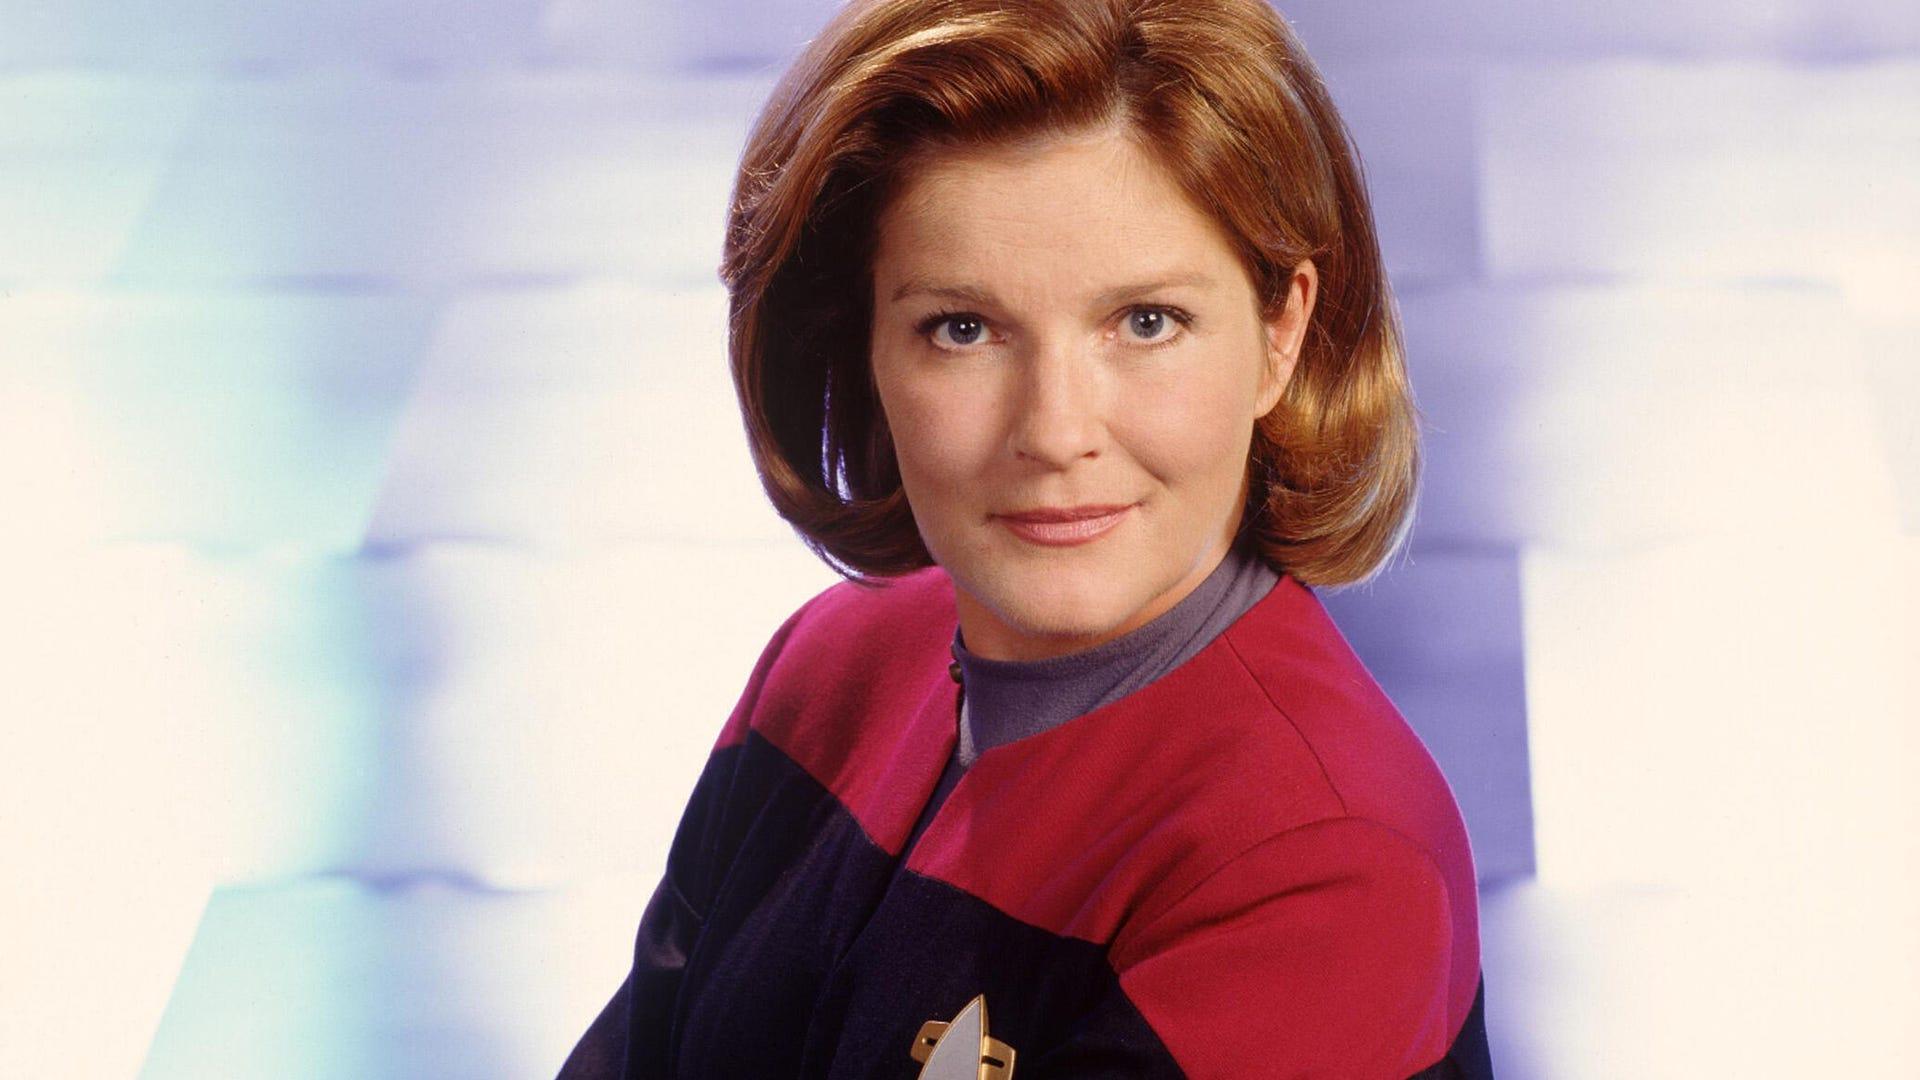 Kate Mulgrew, Star Trek: Voyager